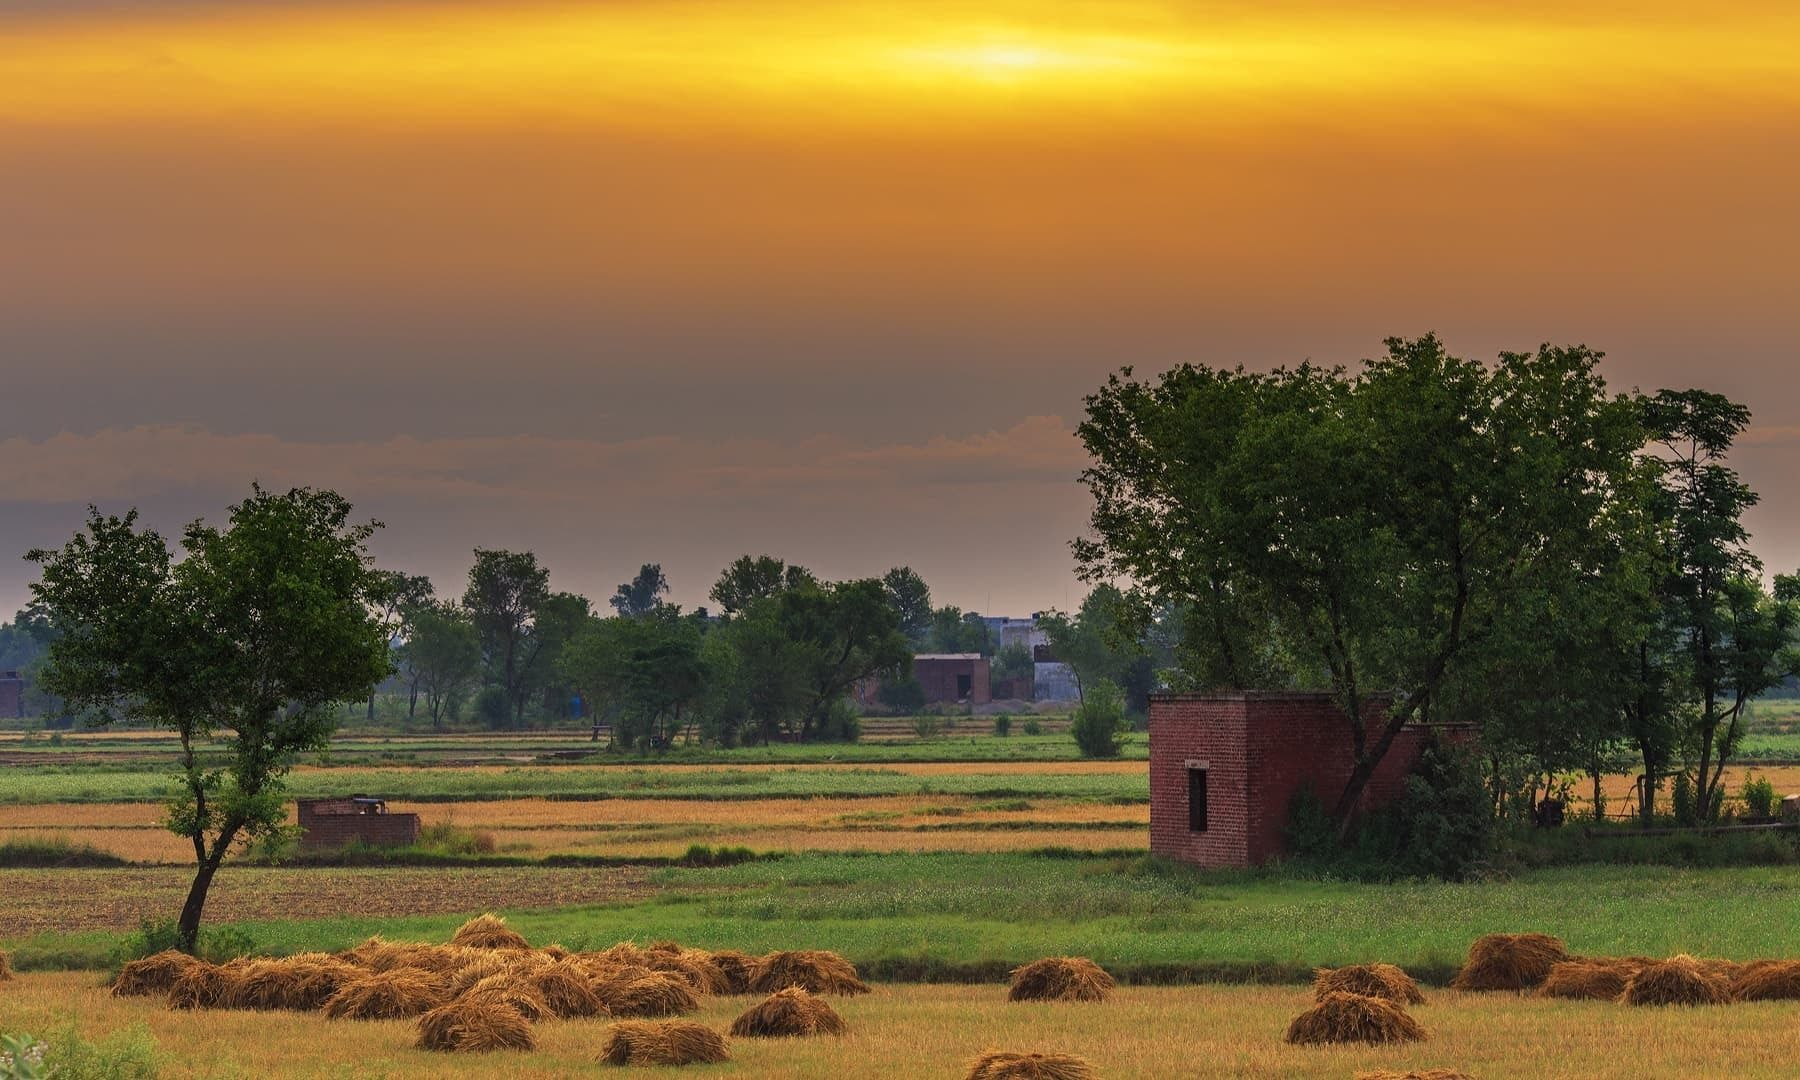 Chenab Pakistan S River Of Love Village Photography Pakistan Travel Landscape Photography